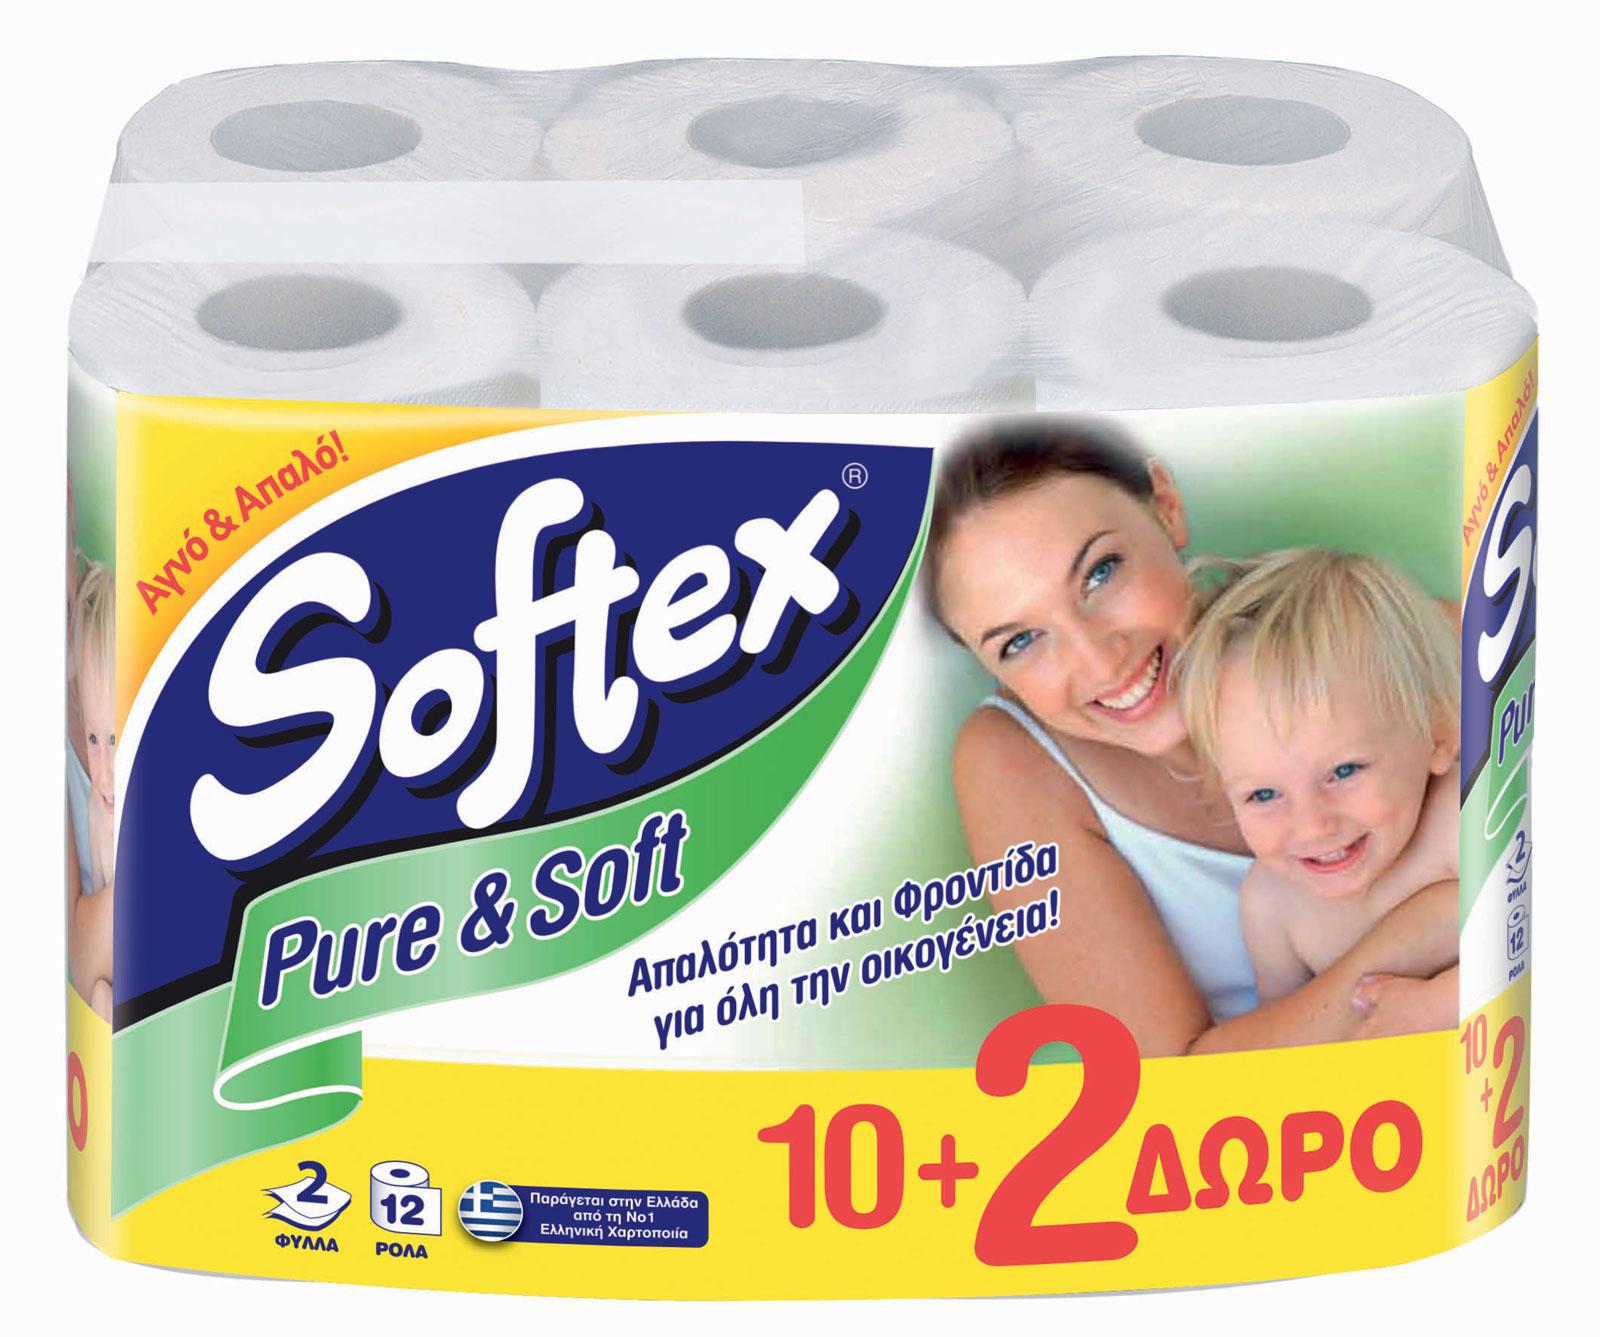 SOFTEX-PURE-&-SOFT-12(10+2)